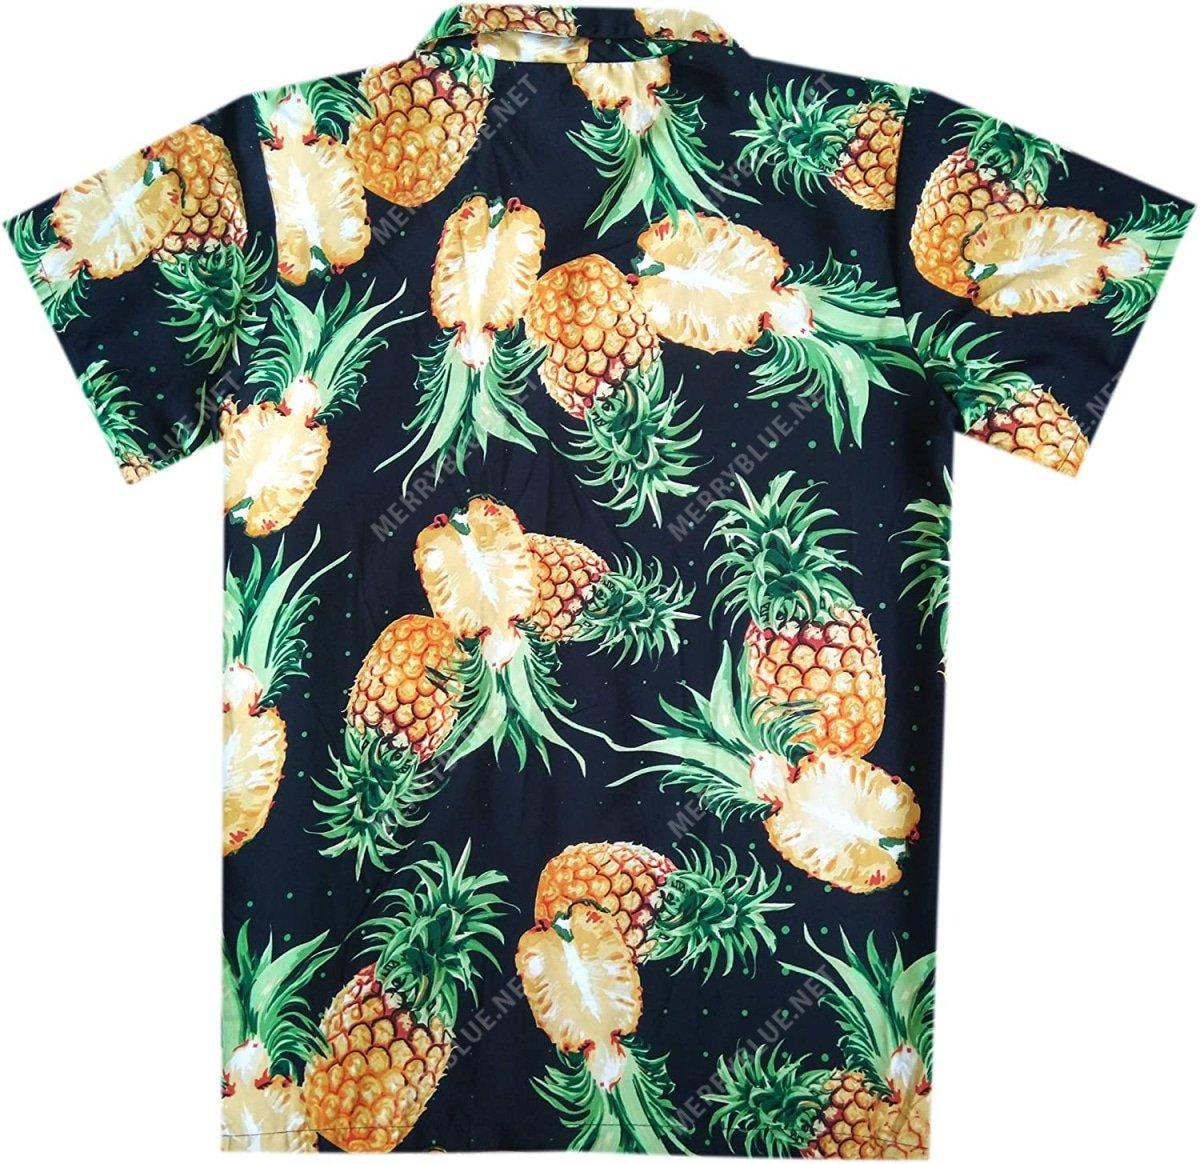 pineapple tropical all over printed hawaiian shirt 5